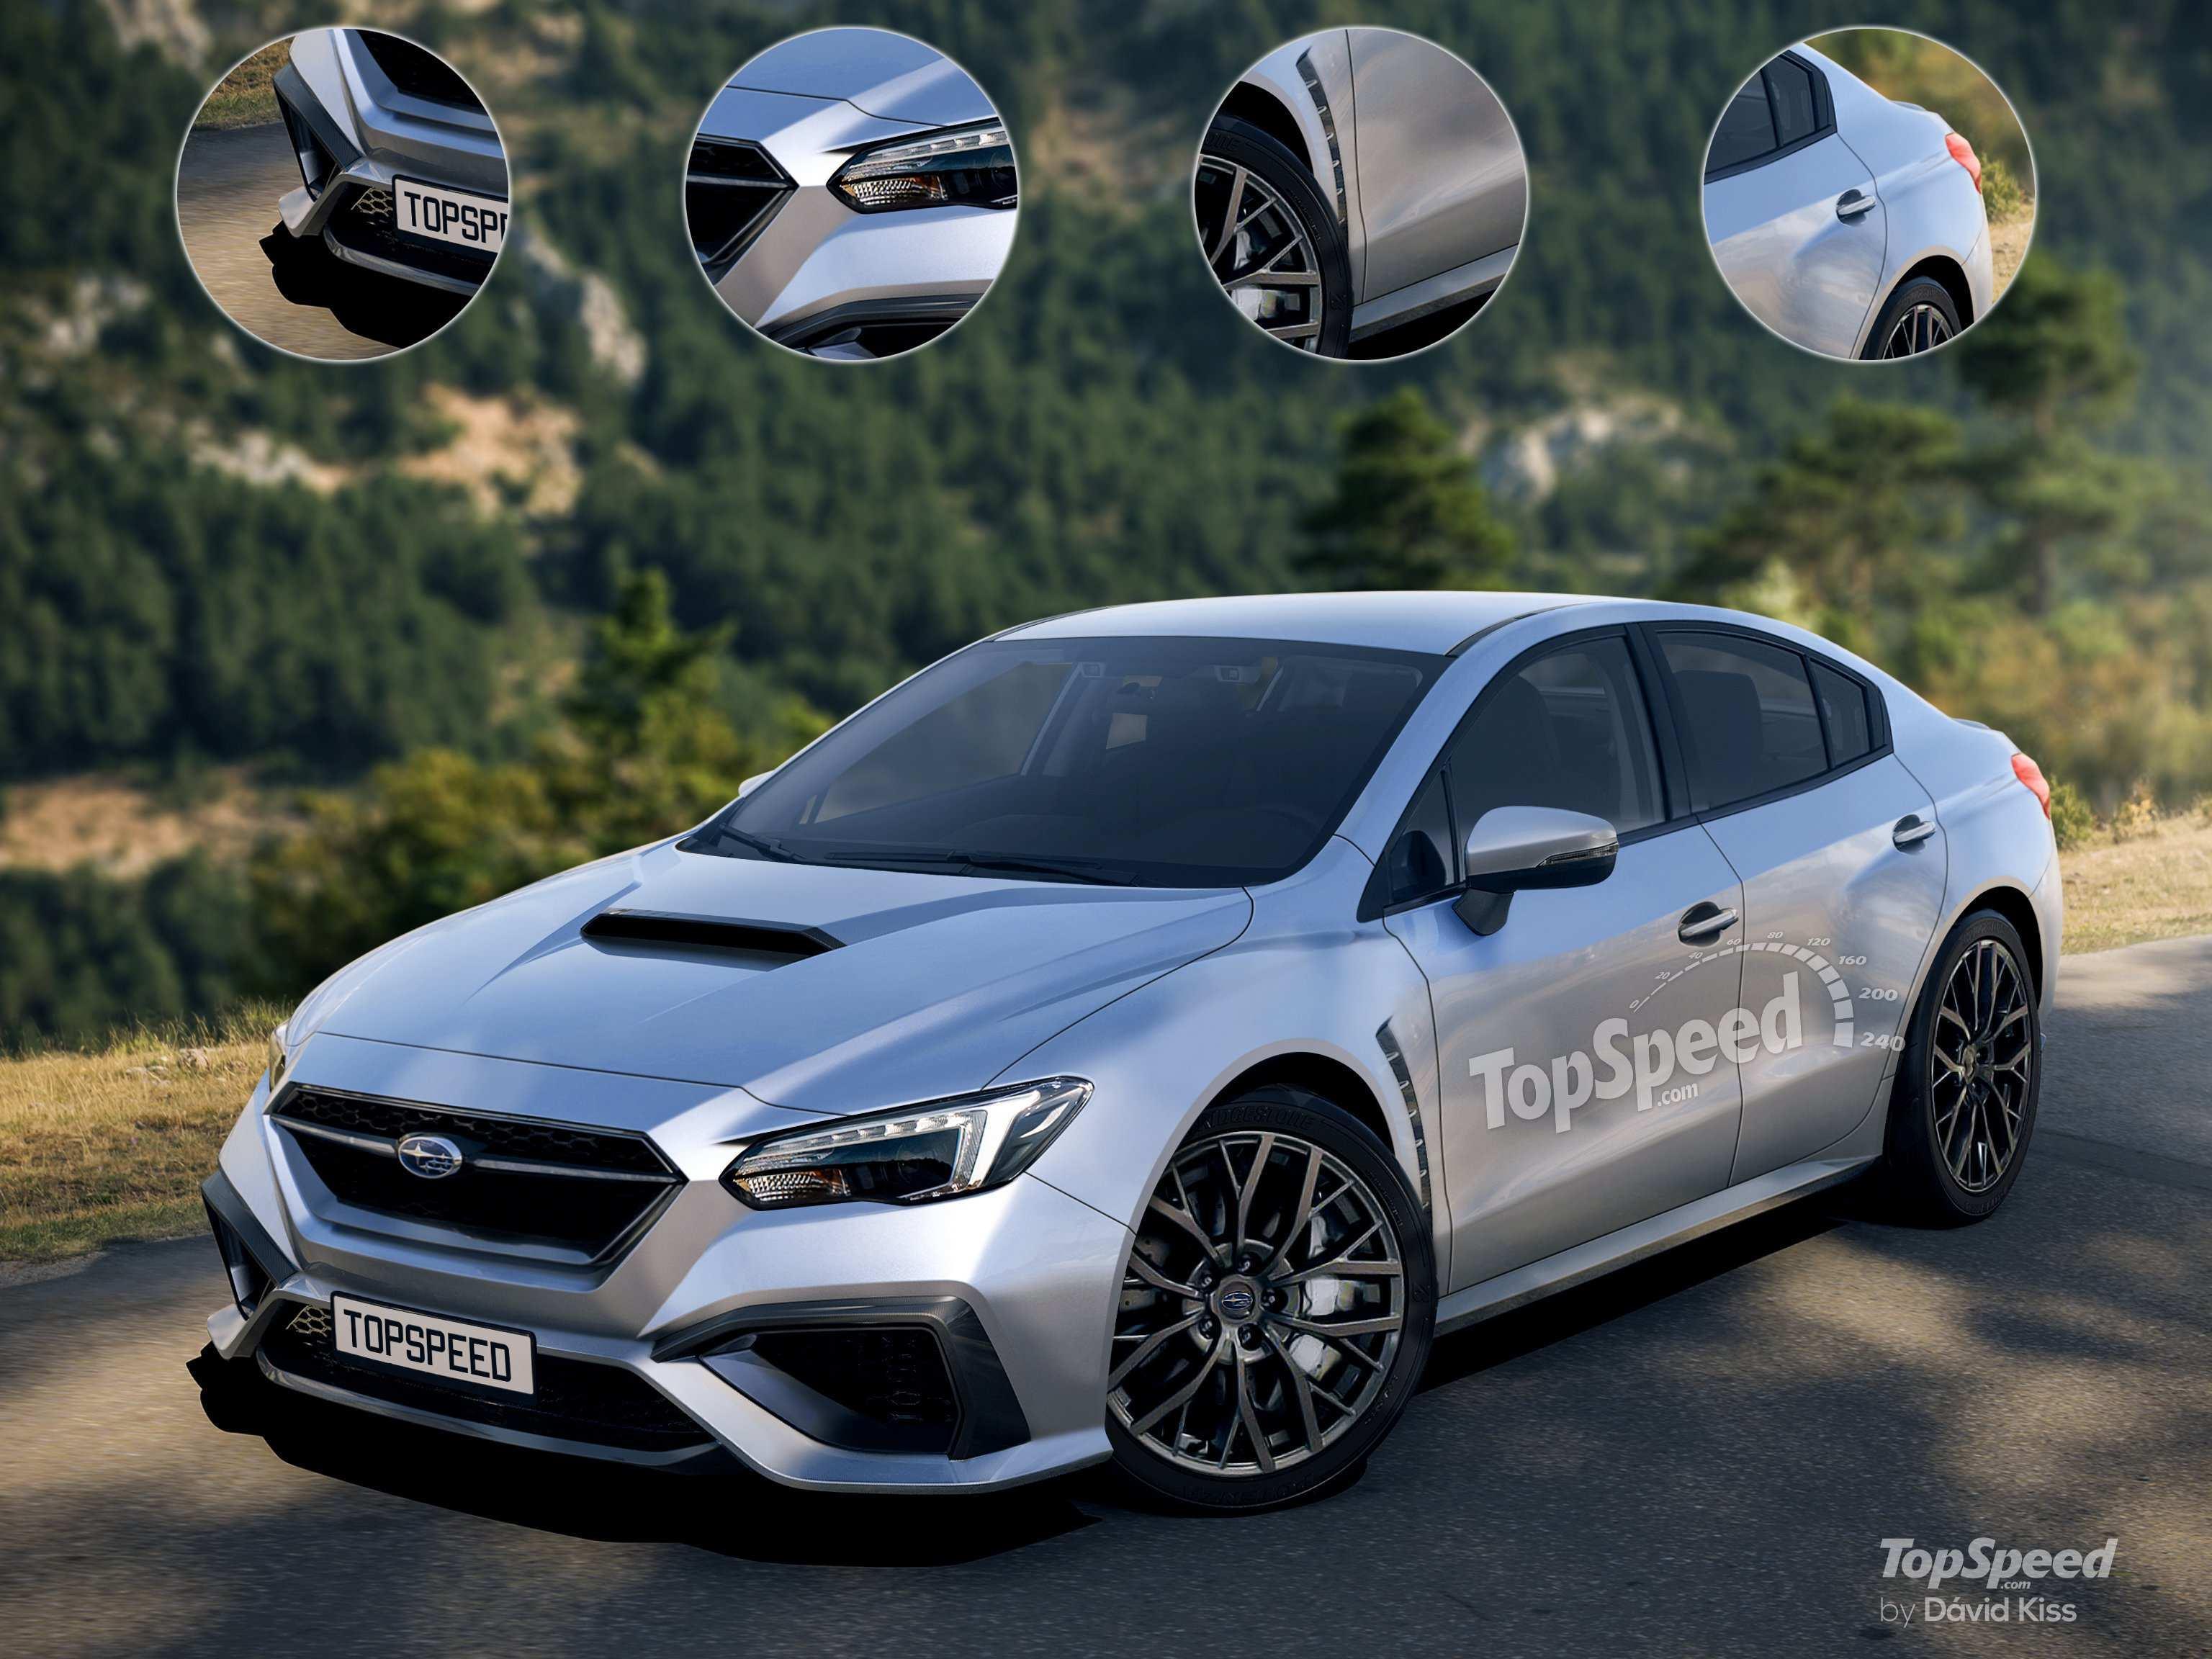 81 Great Subaru Wrx 2020 Style with Subaru Wrx 2020